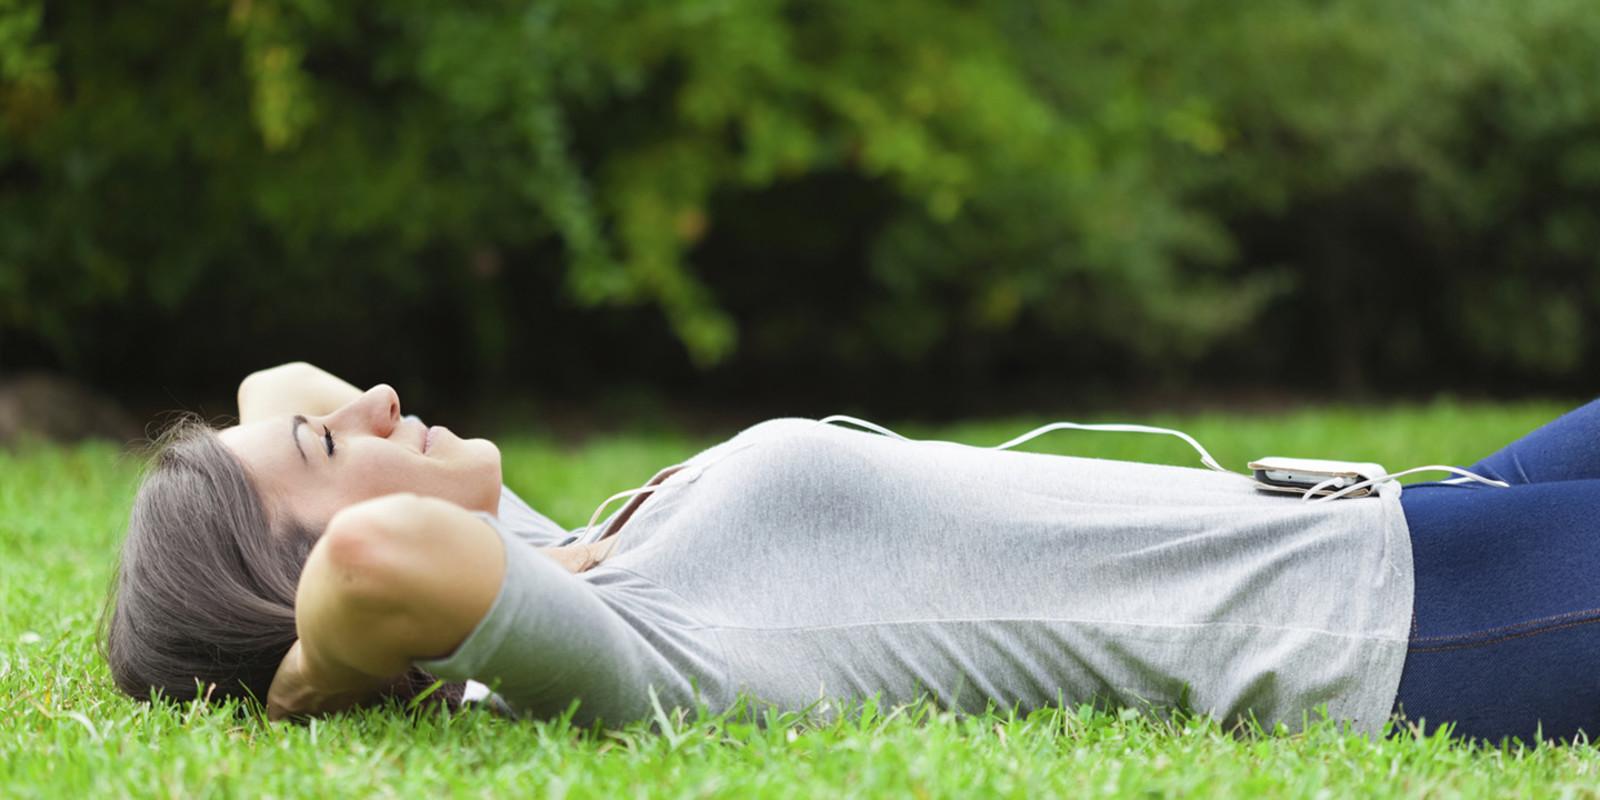 Moving BCN- Reducir el estrés en una mudanza: optimismo